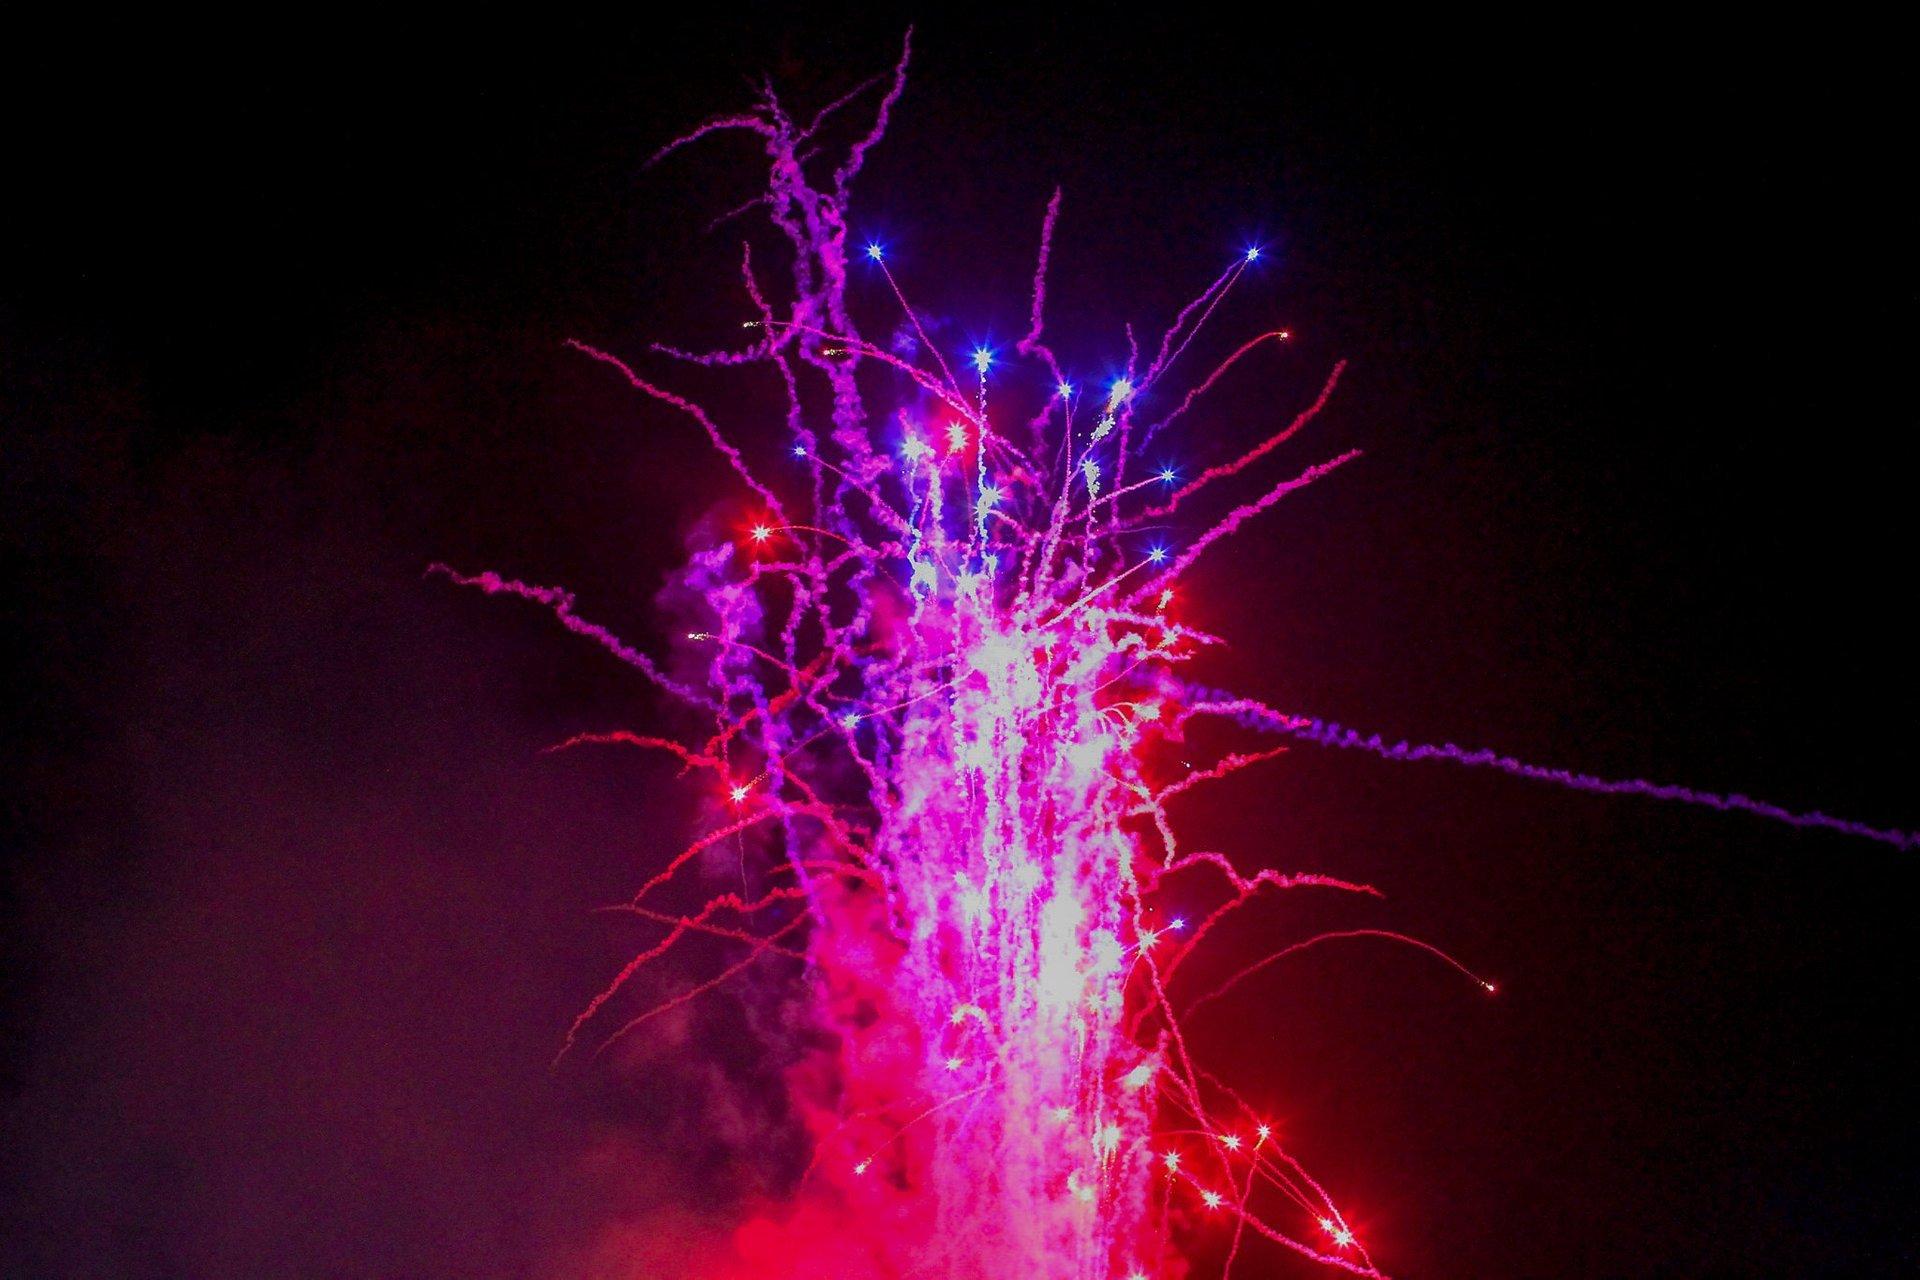 4th of July in Myrtle Beach in Myrtle Beach, SC 2020 - Best Time